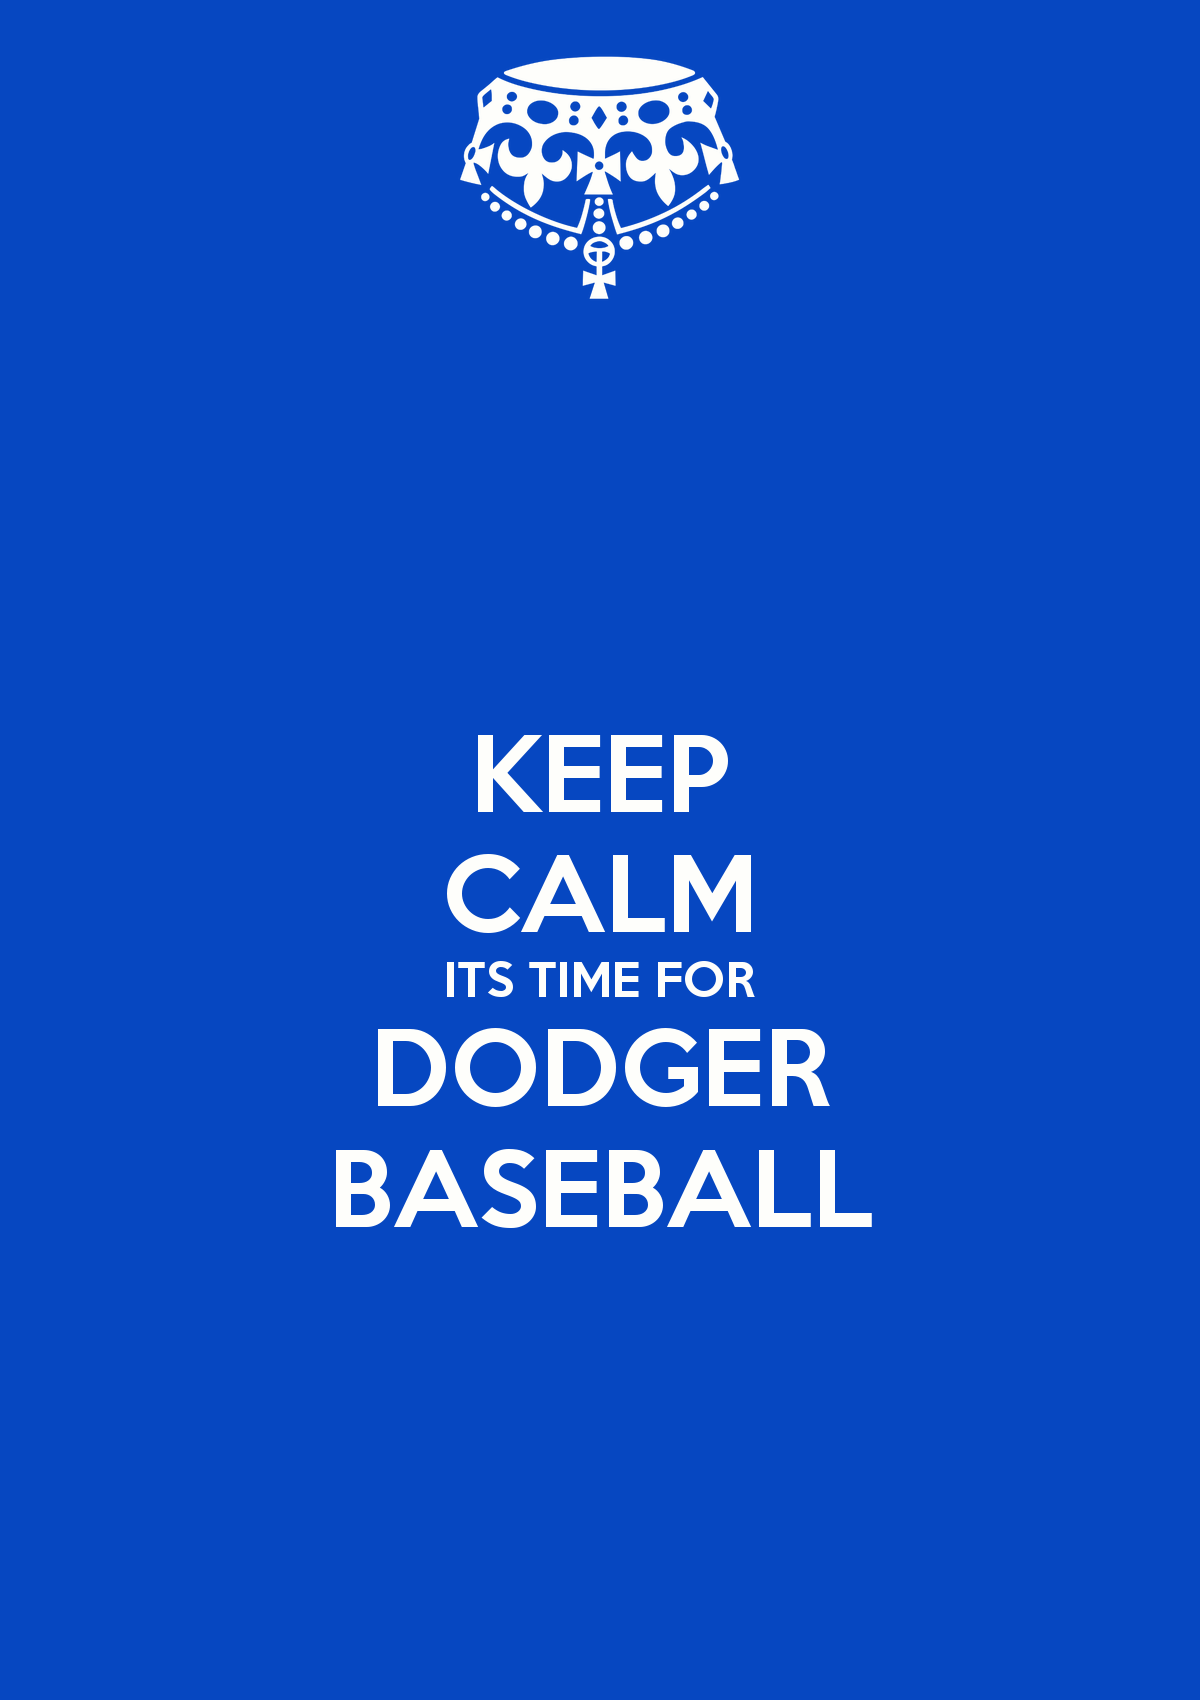 Dodger Baseball Quotes Quotesgram